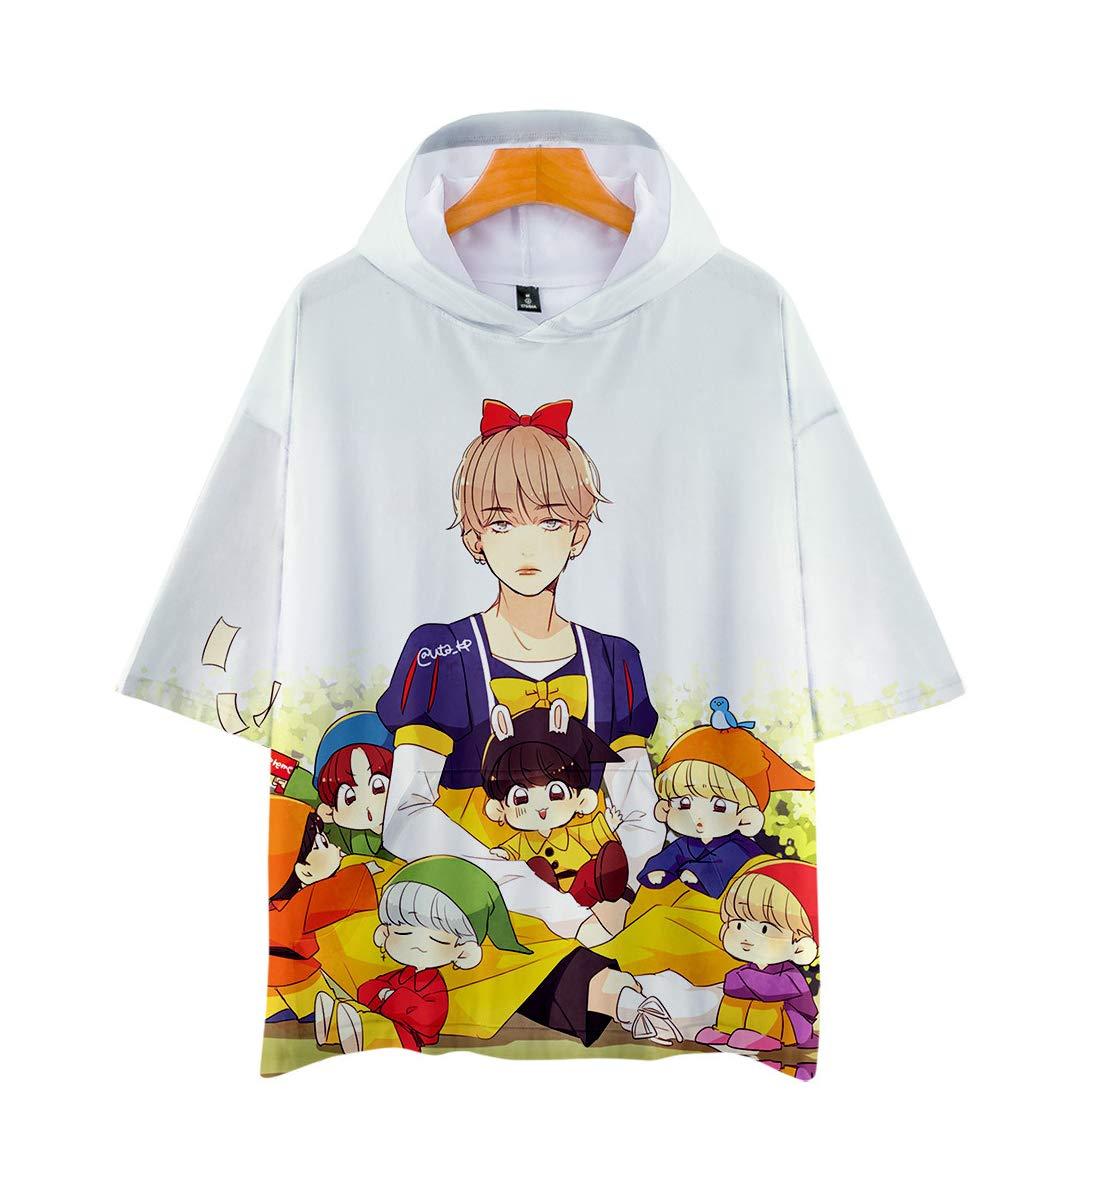 Unisex BTS 3D Hoodie Short Sleeve T-Shirt for Men Women Teen Bangtan Boys Jin Suga J-Hope RM Jimin V Jung Kook Summer Tops Sweater Pullover Jackets